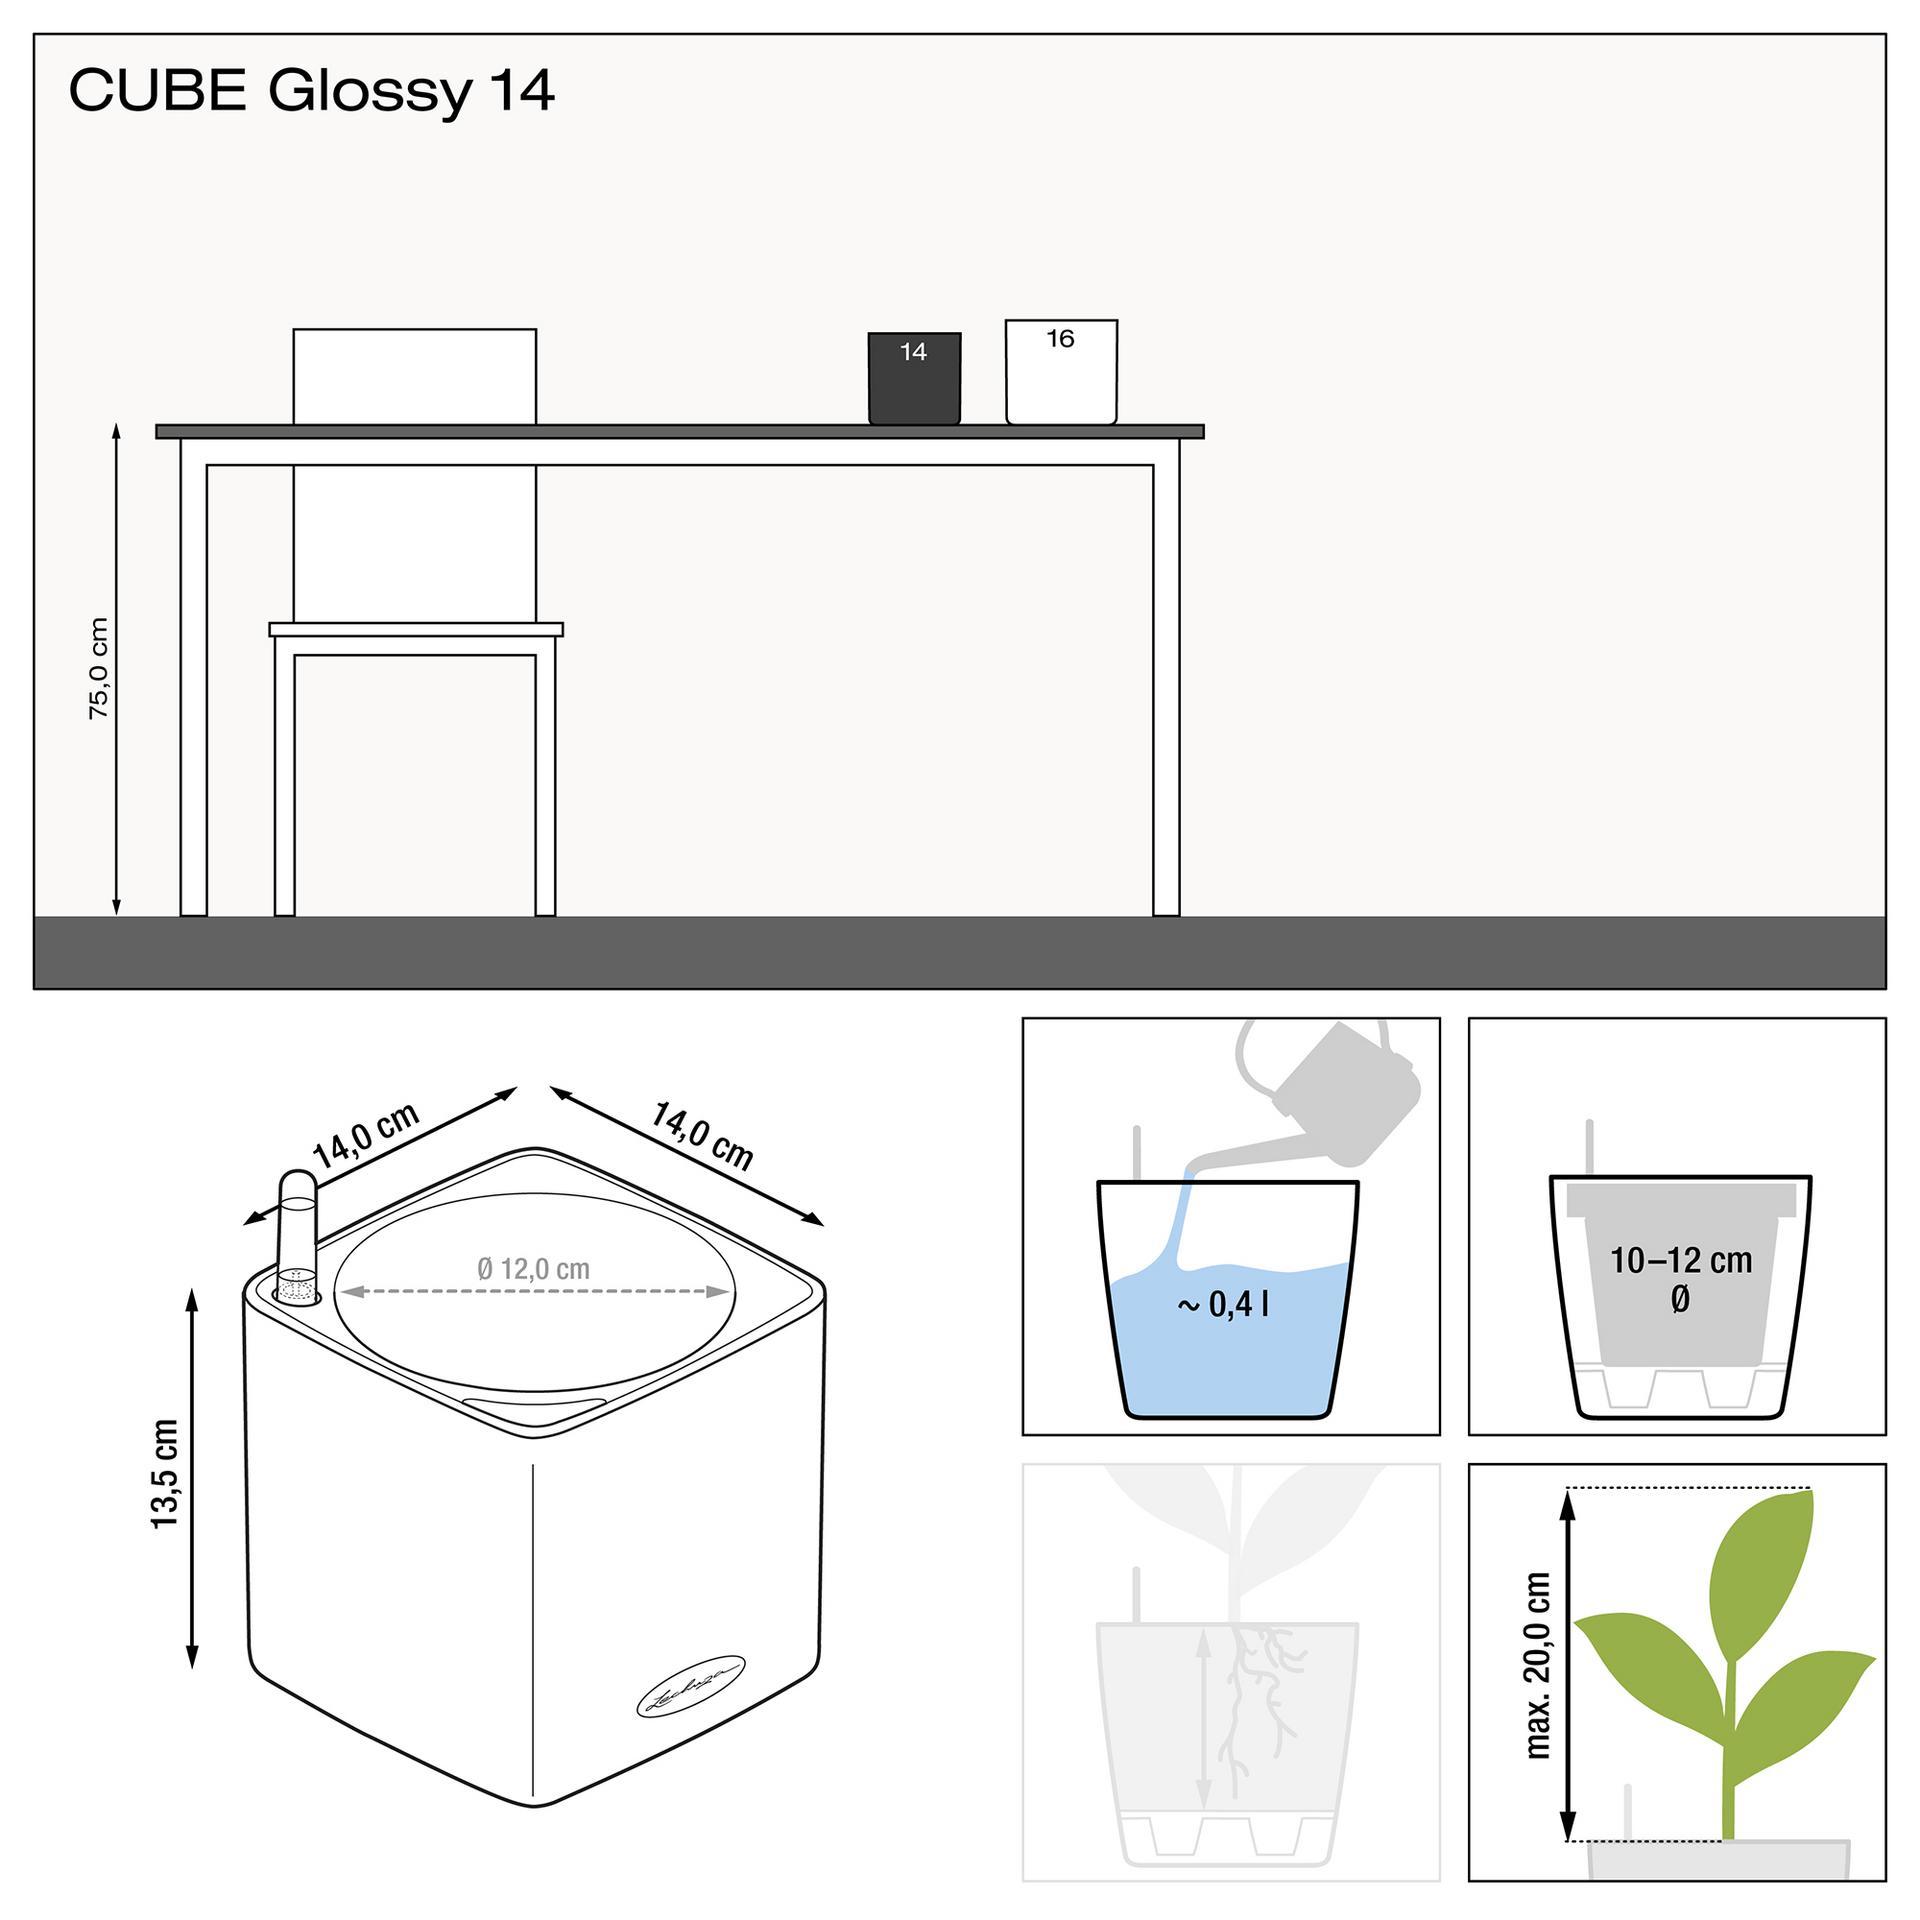 le_cube-glossy14_product_addi_nz